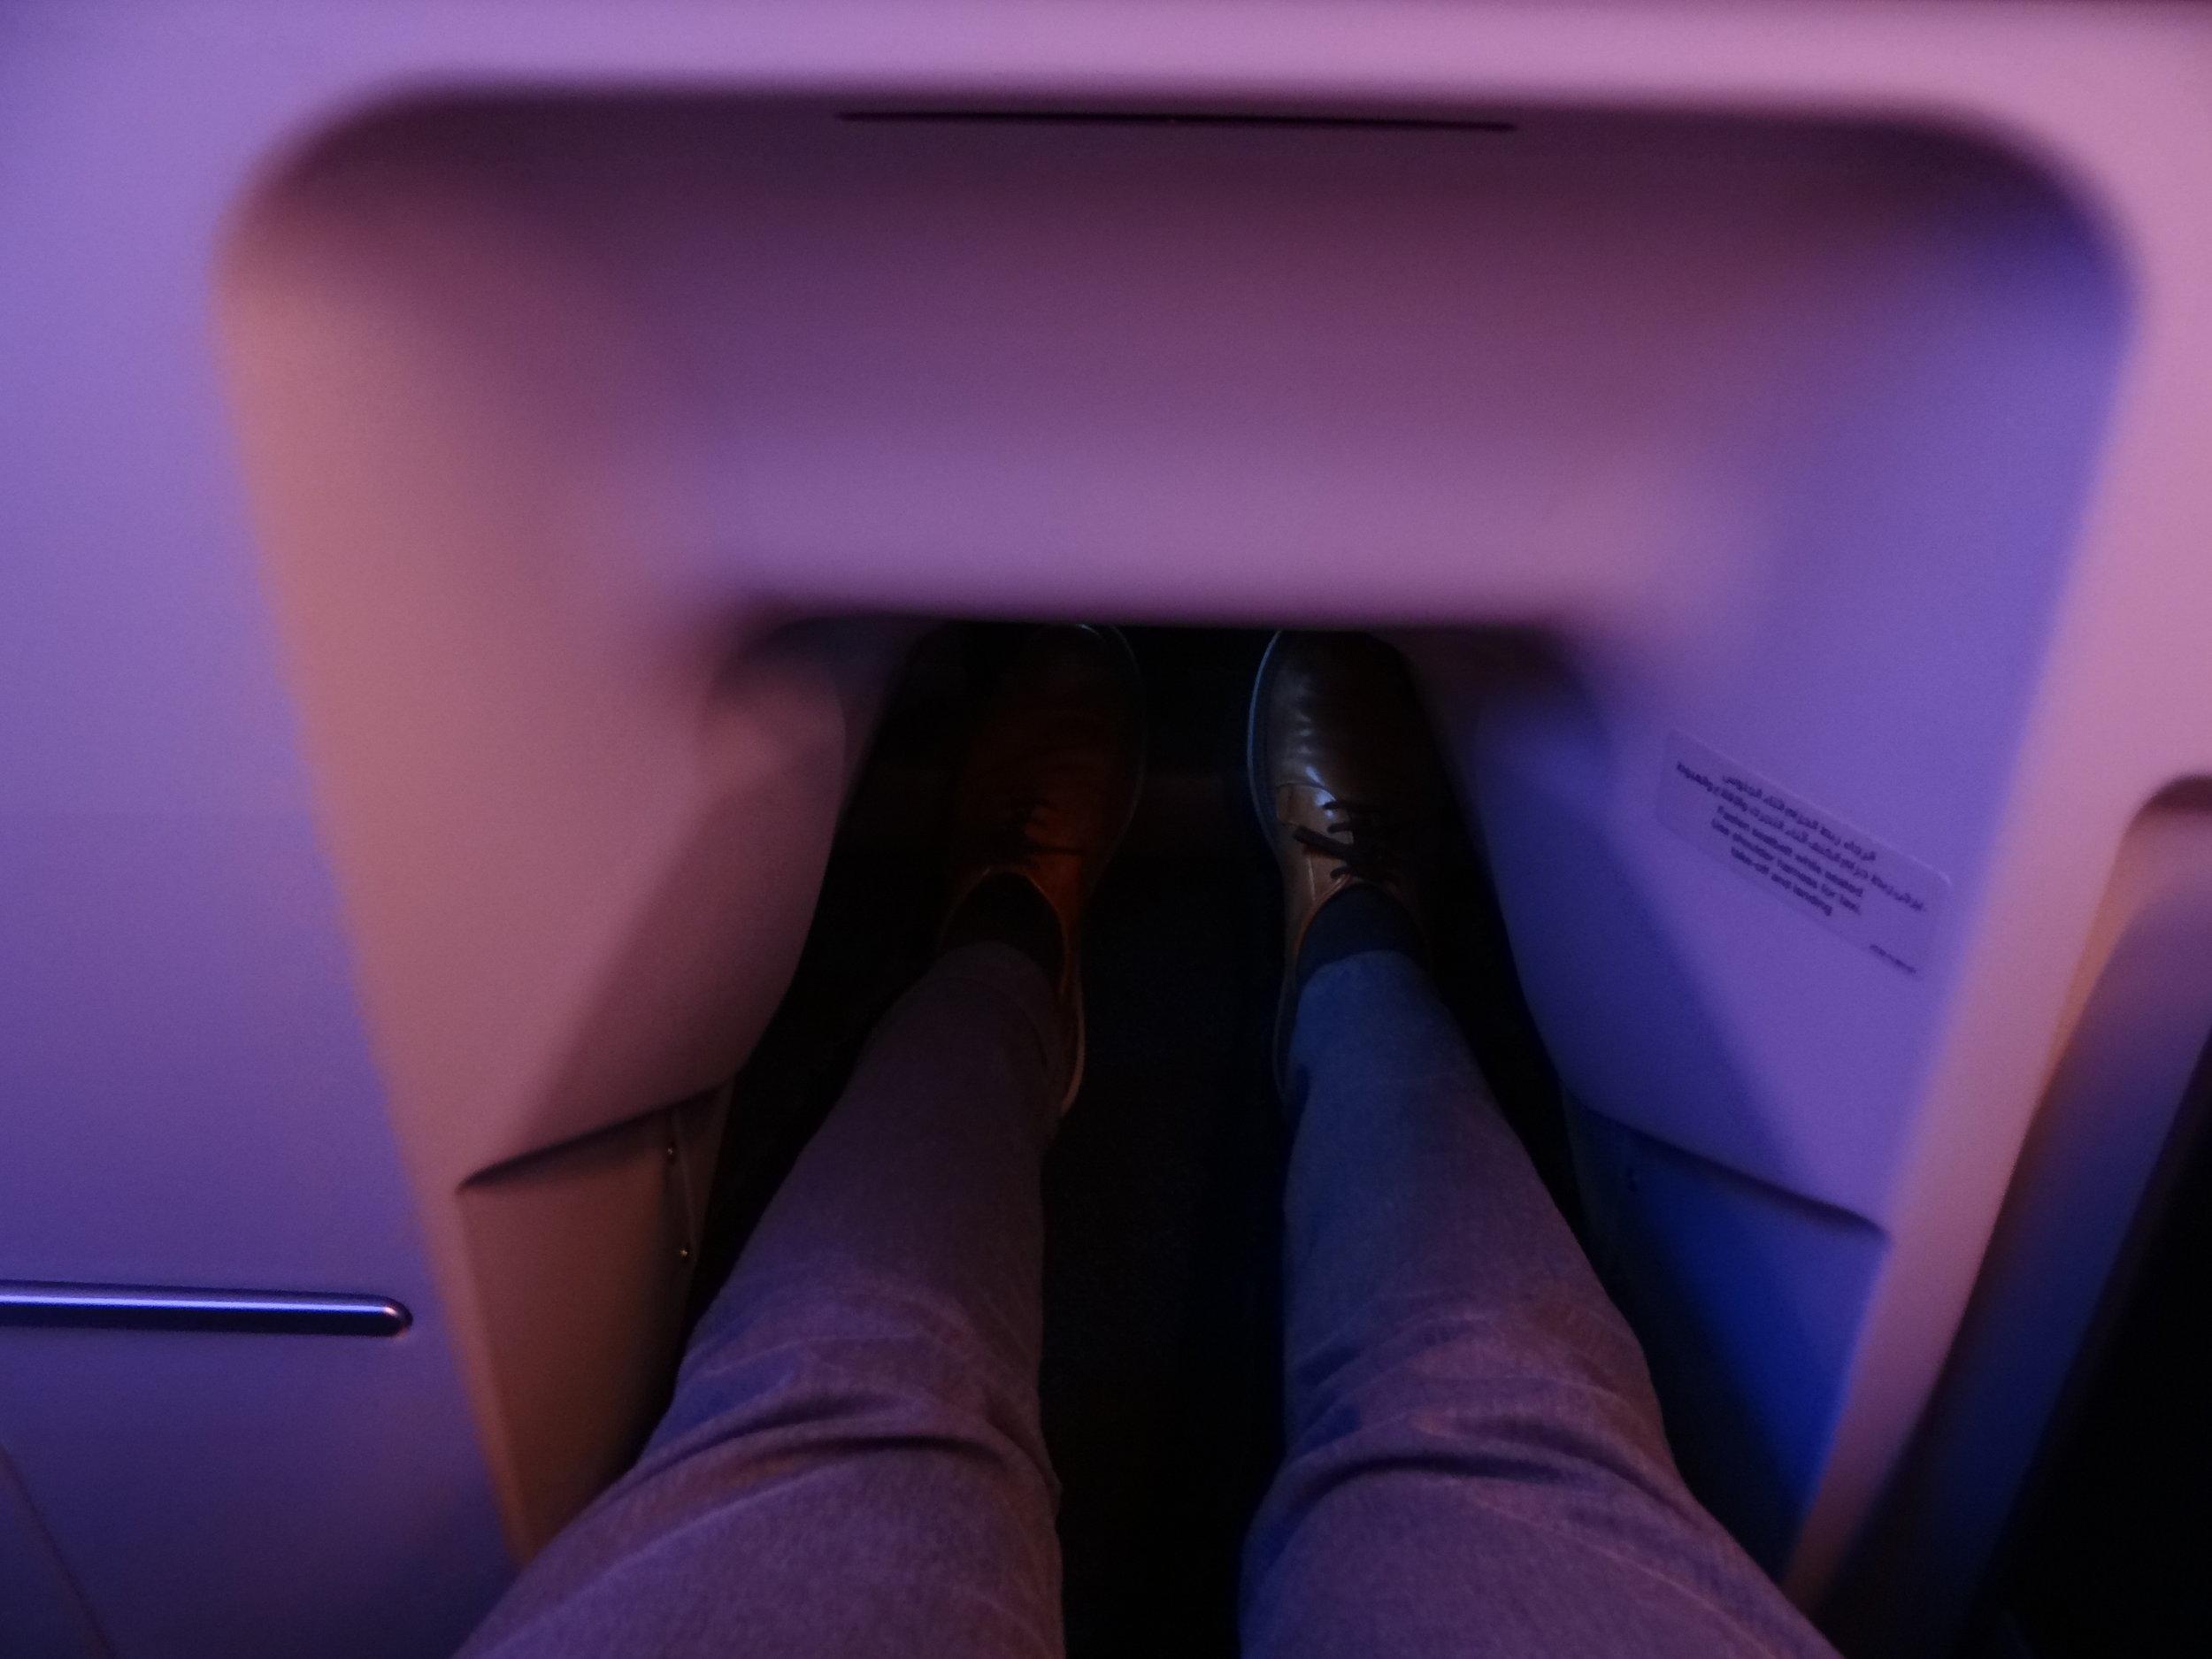 flydubai business class seat pitch.jpg